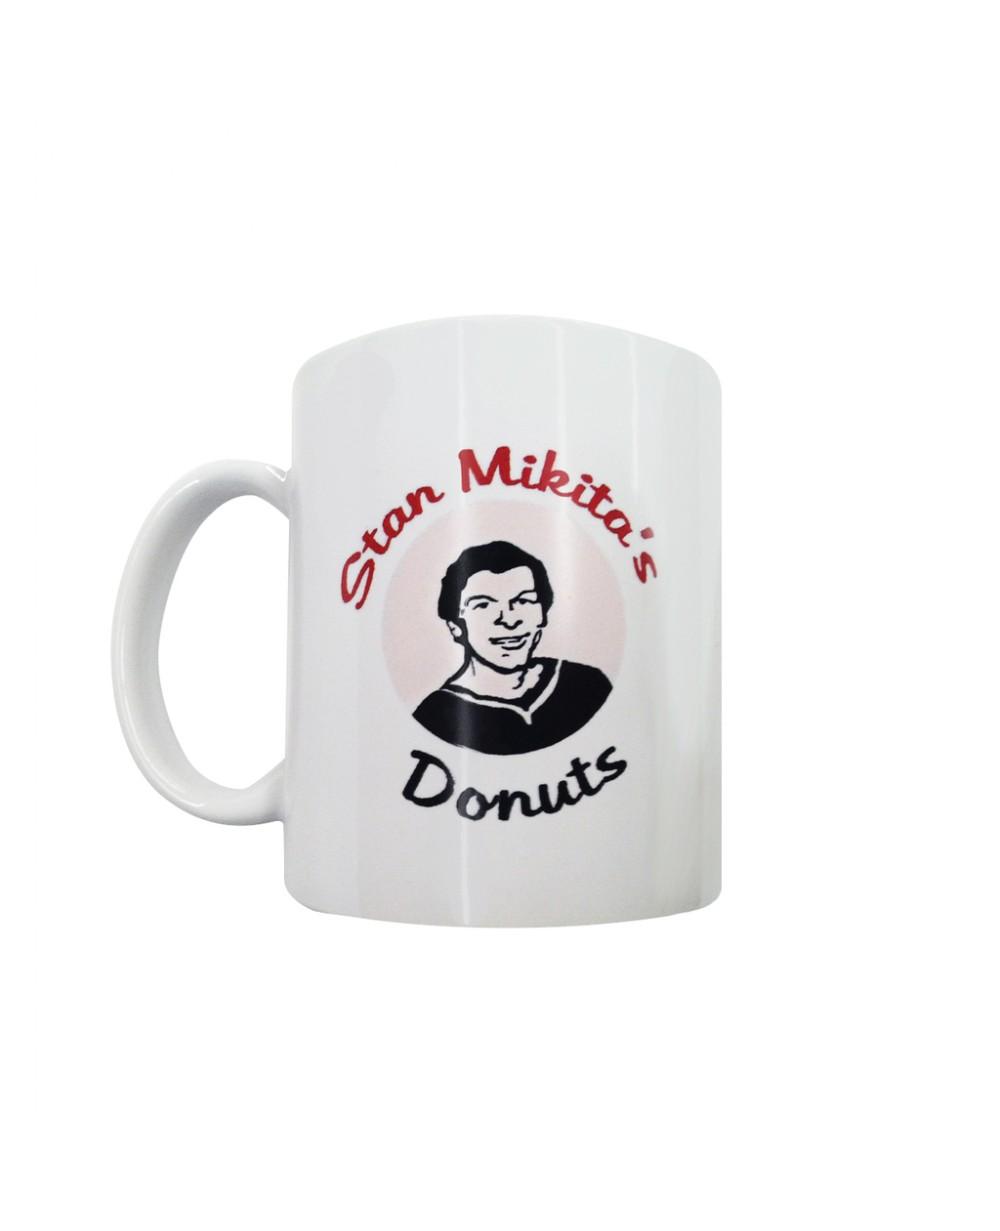 bf8debb7748 Stan Mikita's Donuts 11 oz Coffee Mug